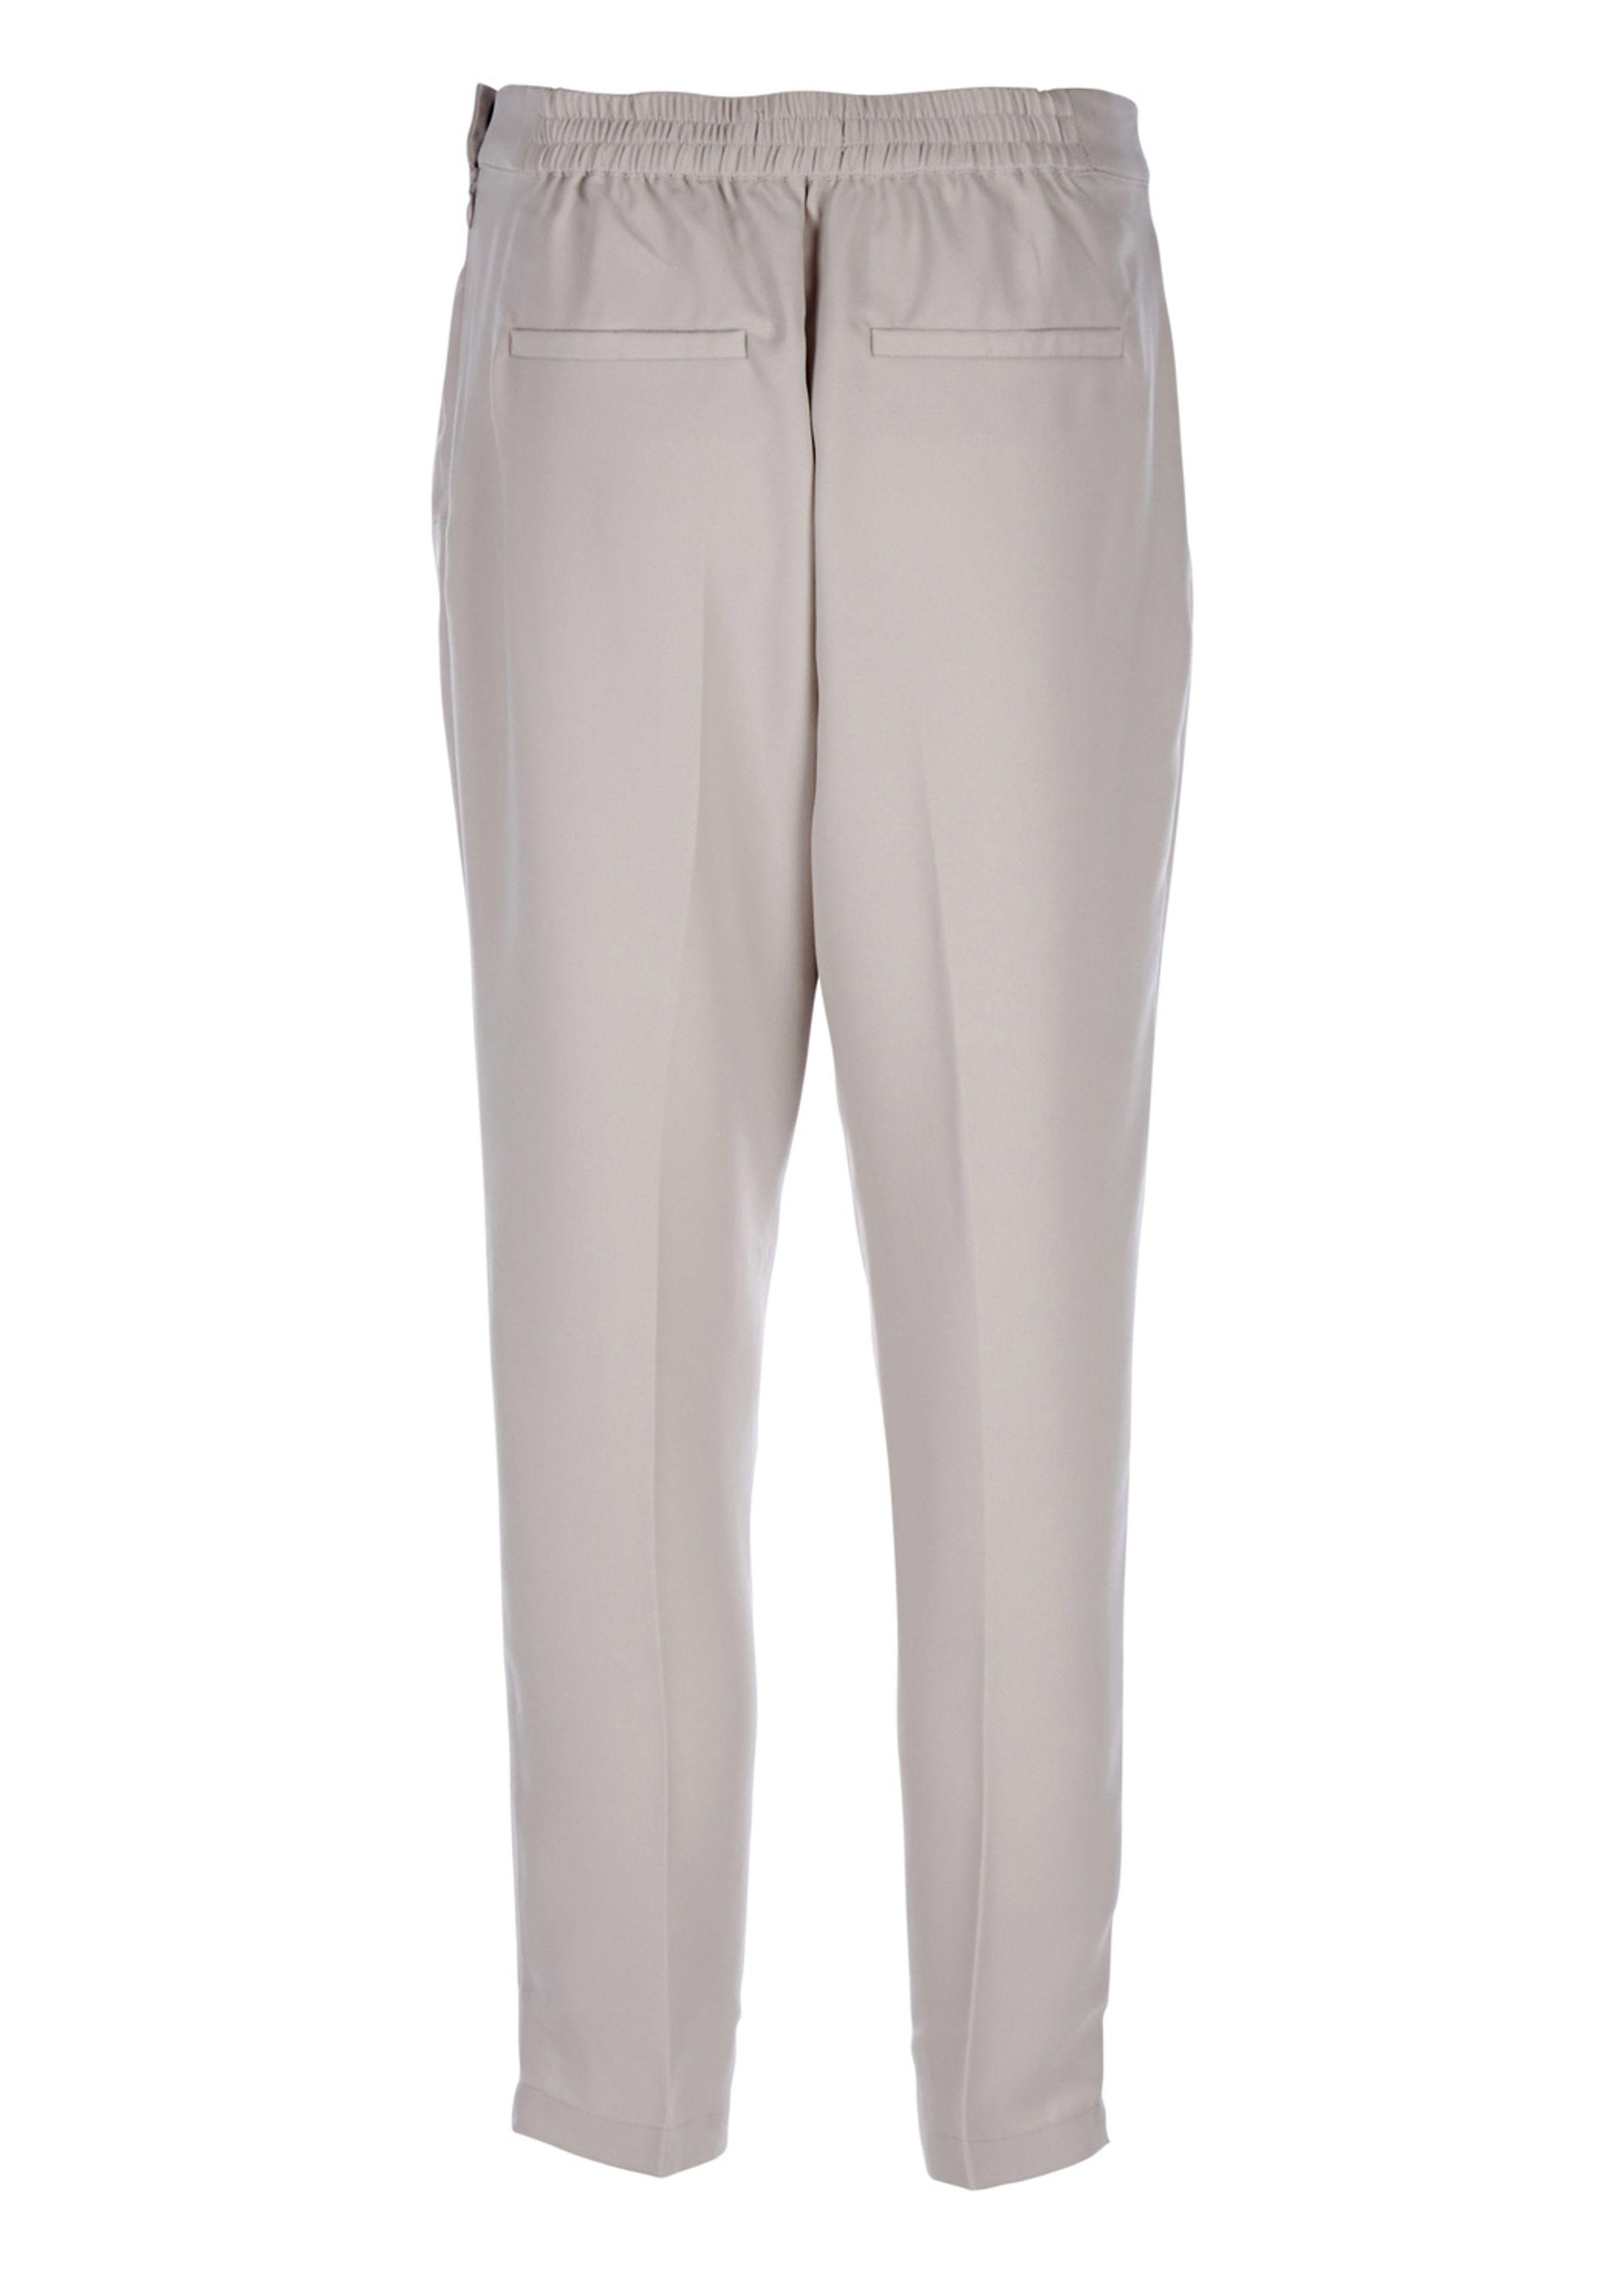 57e49200 ... Selected Femme - Pants - Steffi Cropped Pants - Light Grey ...